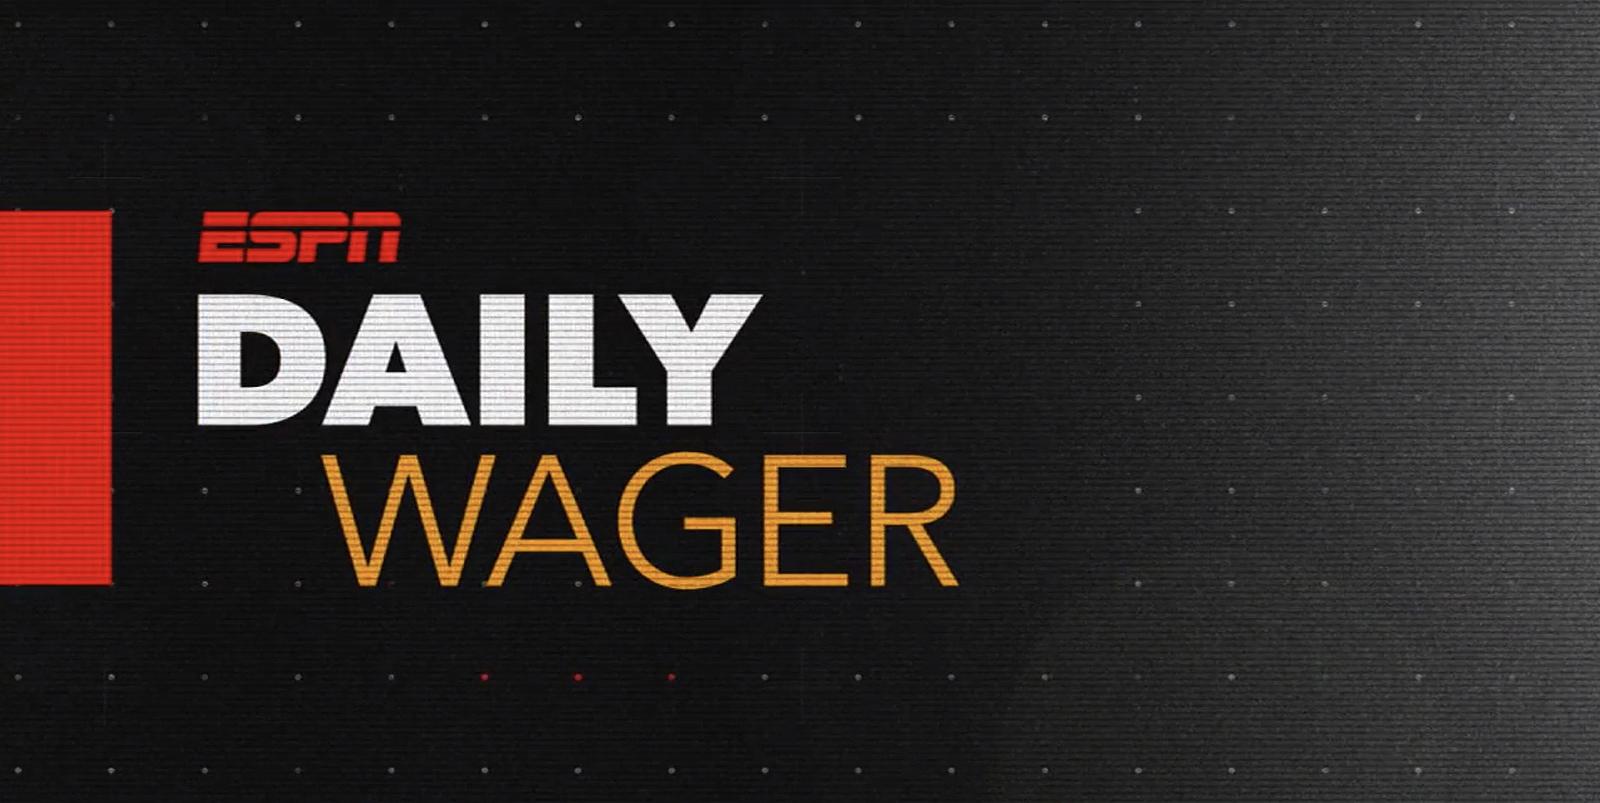 NCS_ESPN-Daily-Wager_Doug-Kezirian_0008